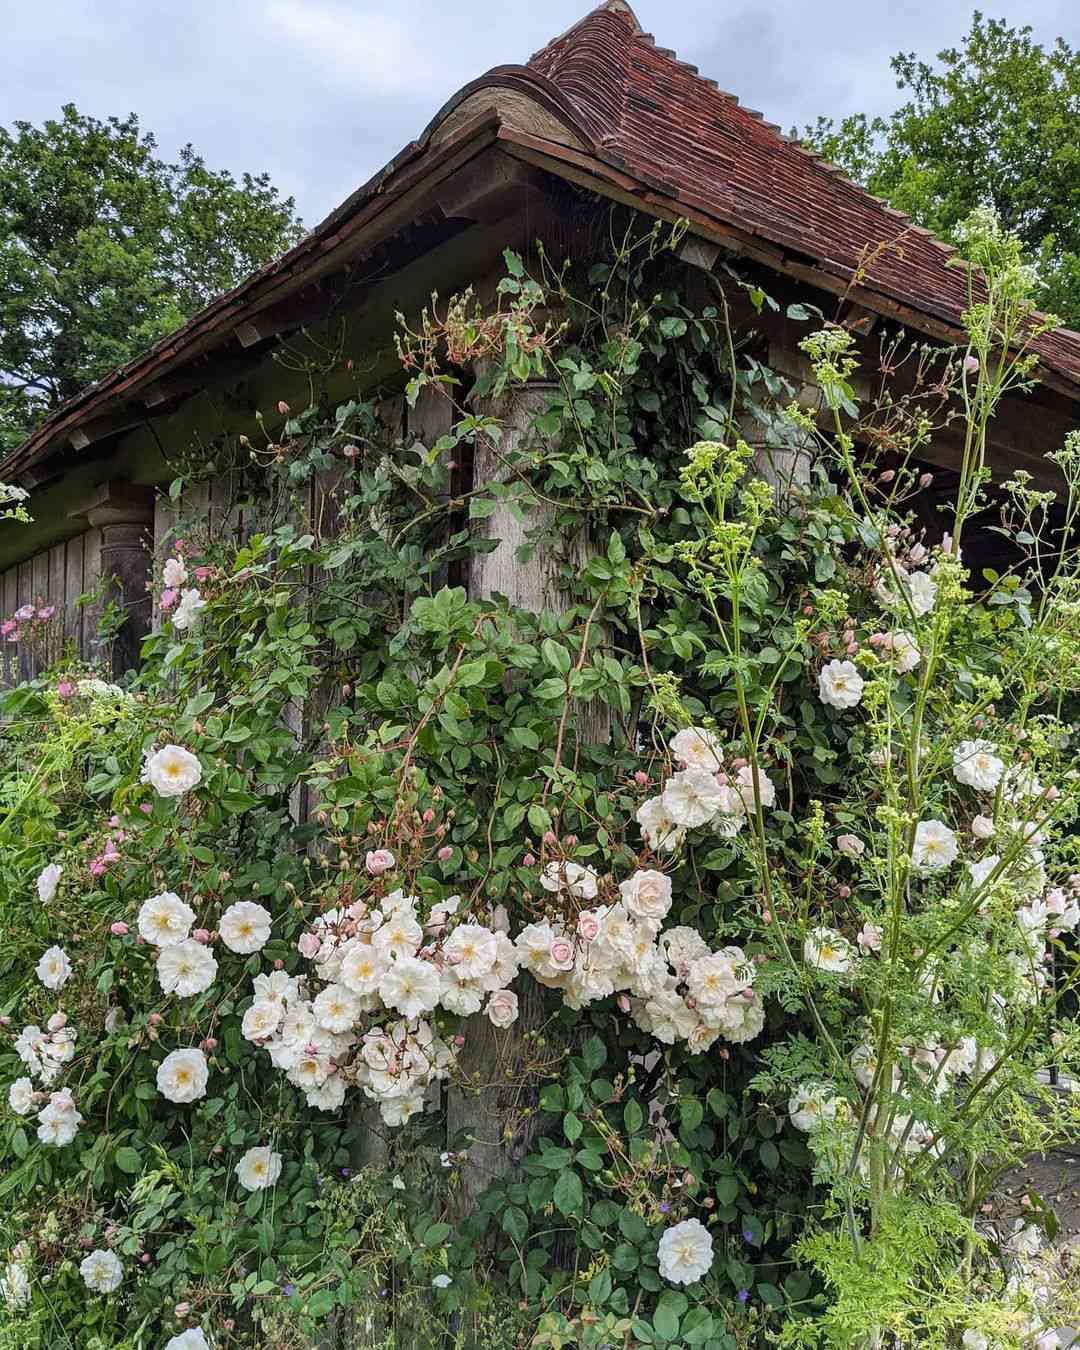 Wild rose garden with white roses.